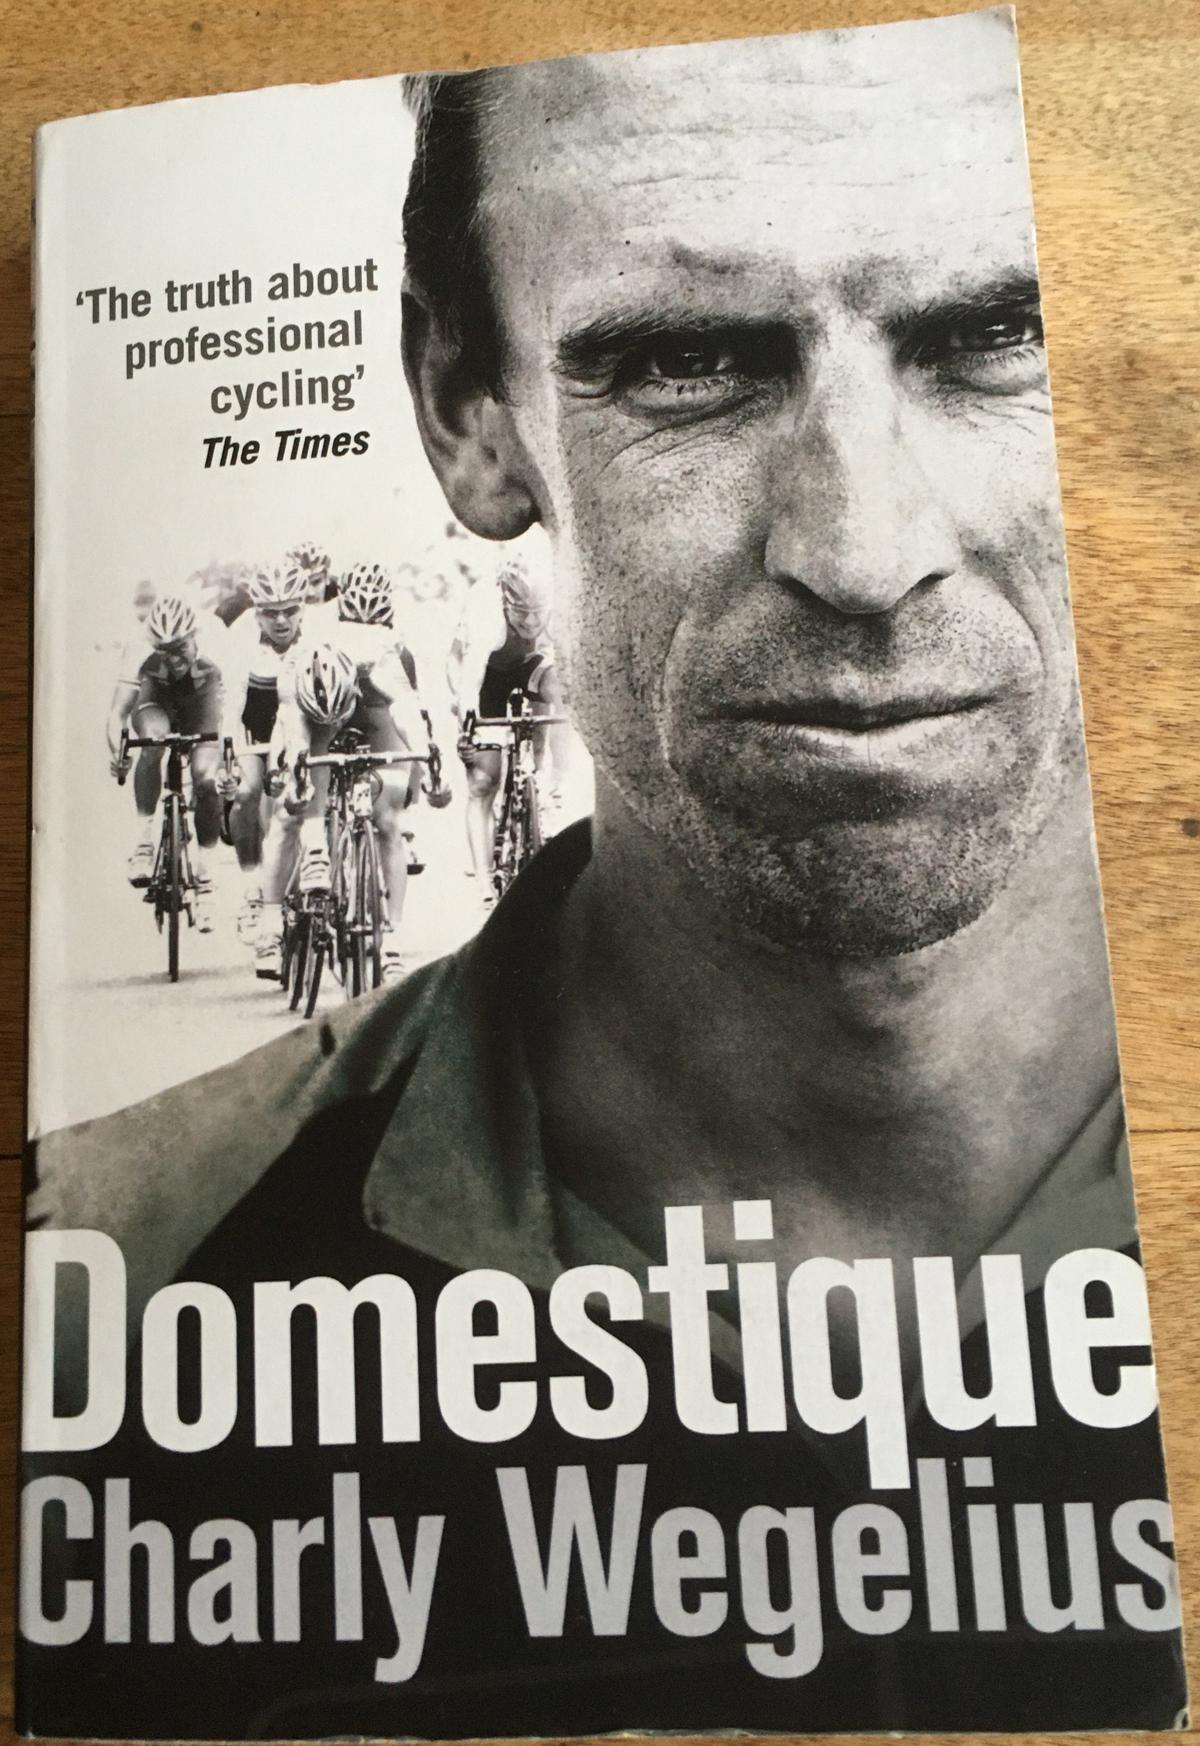 Domestique: by Charly Wegelius with Tom Southam (2013), Random House www.randomhouse.co.uk